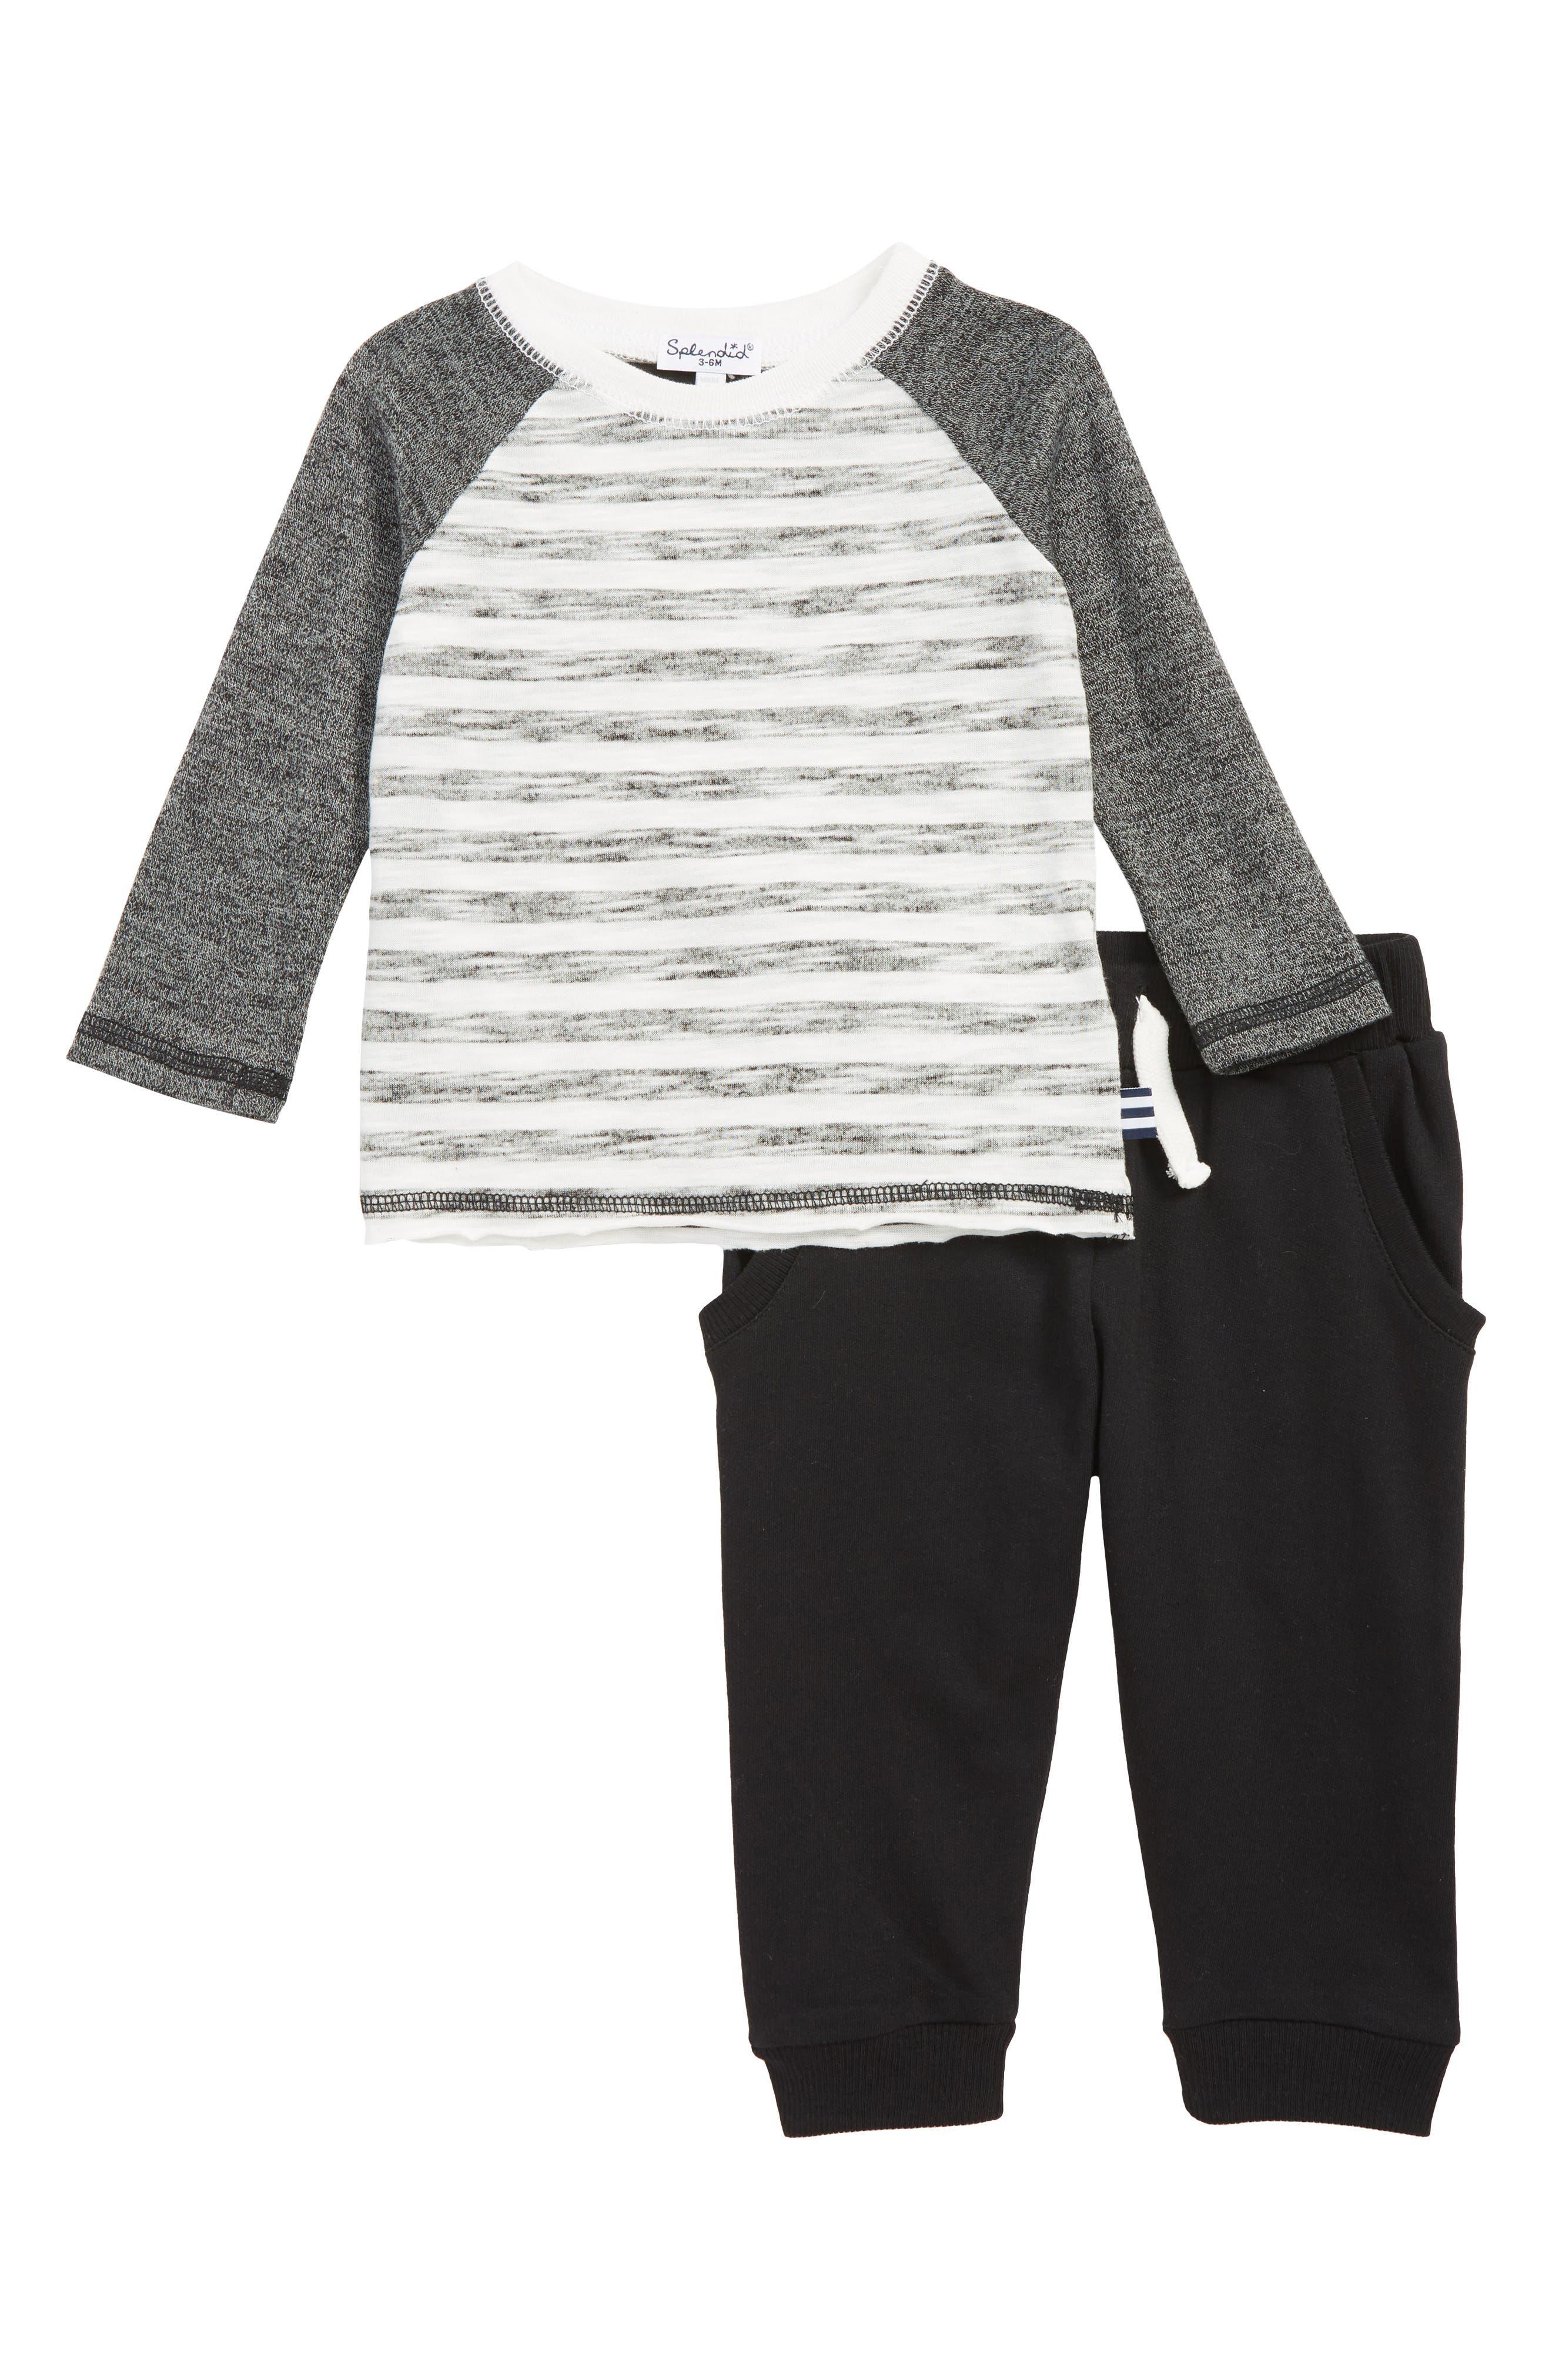 SPLENDID,                             Reverse Print Raglan Shirt & Sweatpants Set,                             Main thumbnail 1, color,                             BLACK